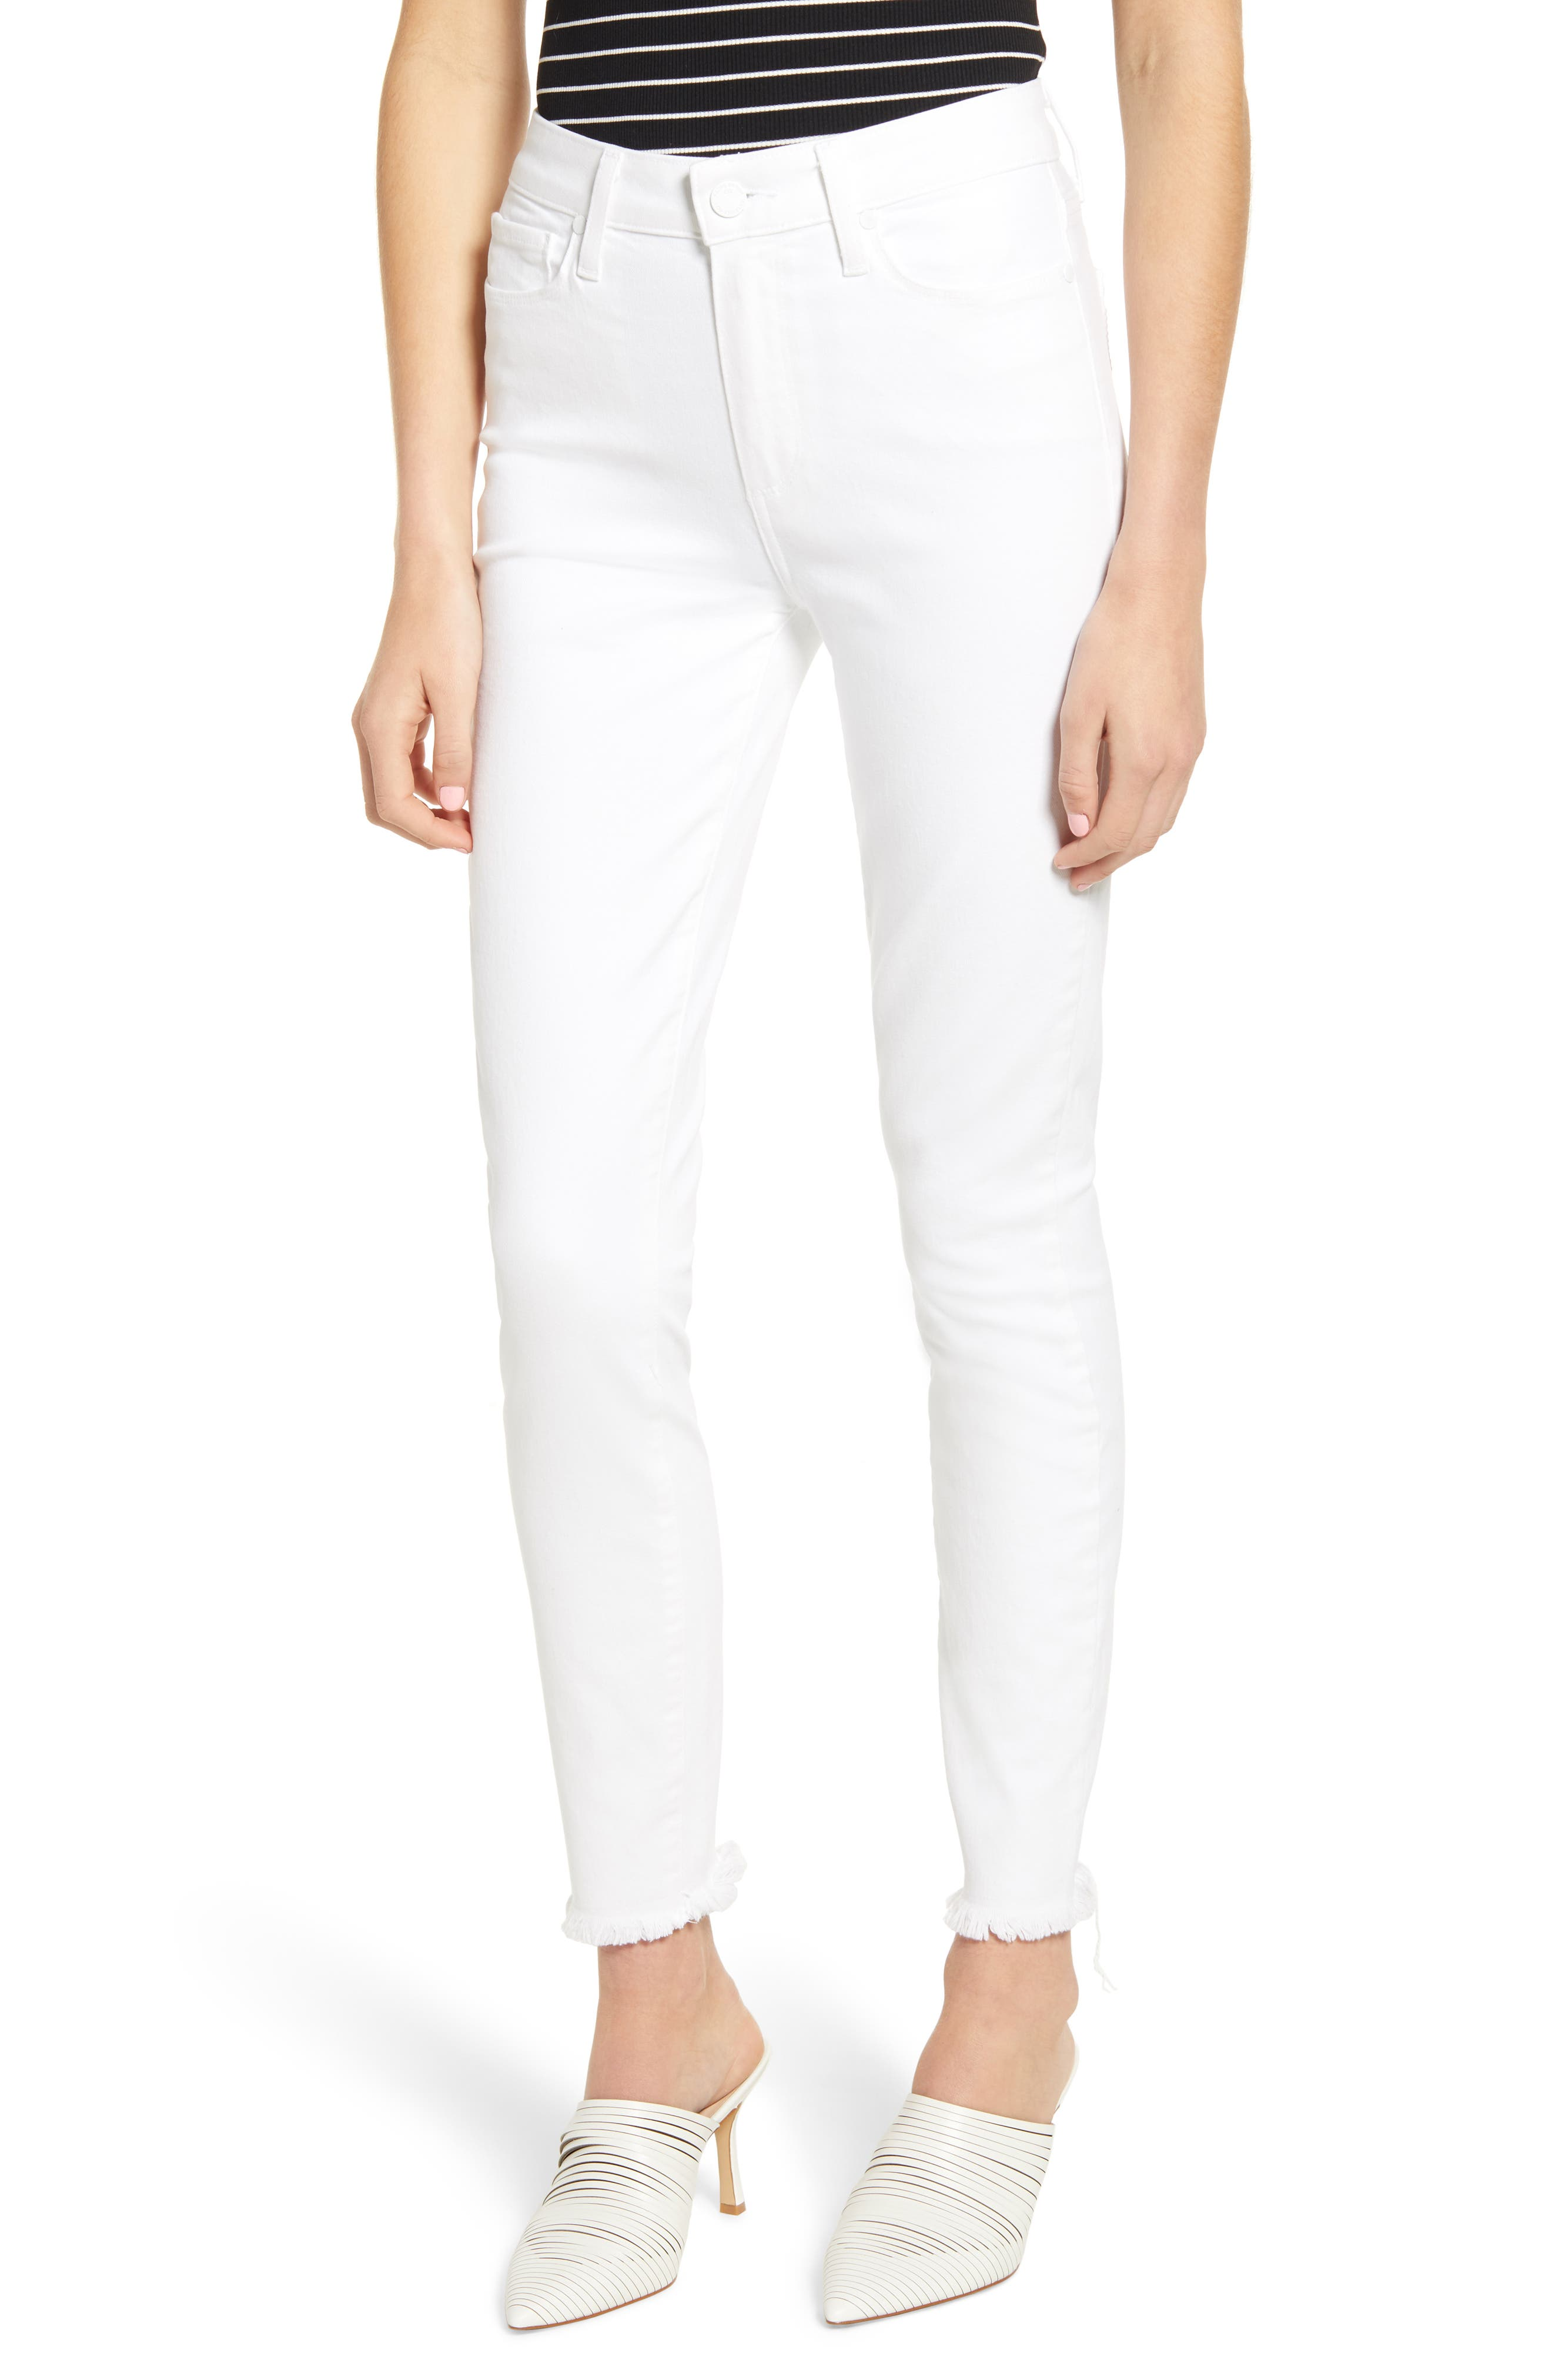 PAIGE Hoxton High Waist Ankle Skinny Jeans, Main, color, CRISP WHITE